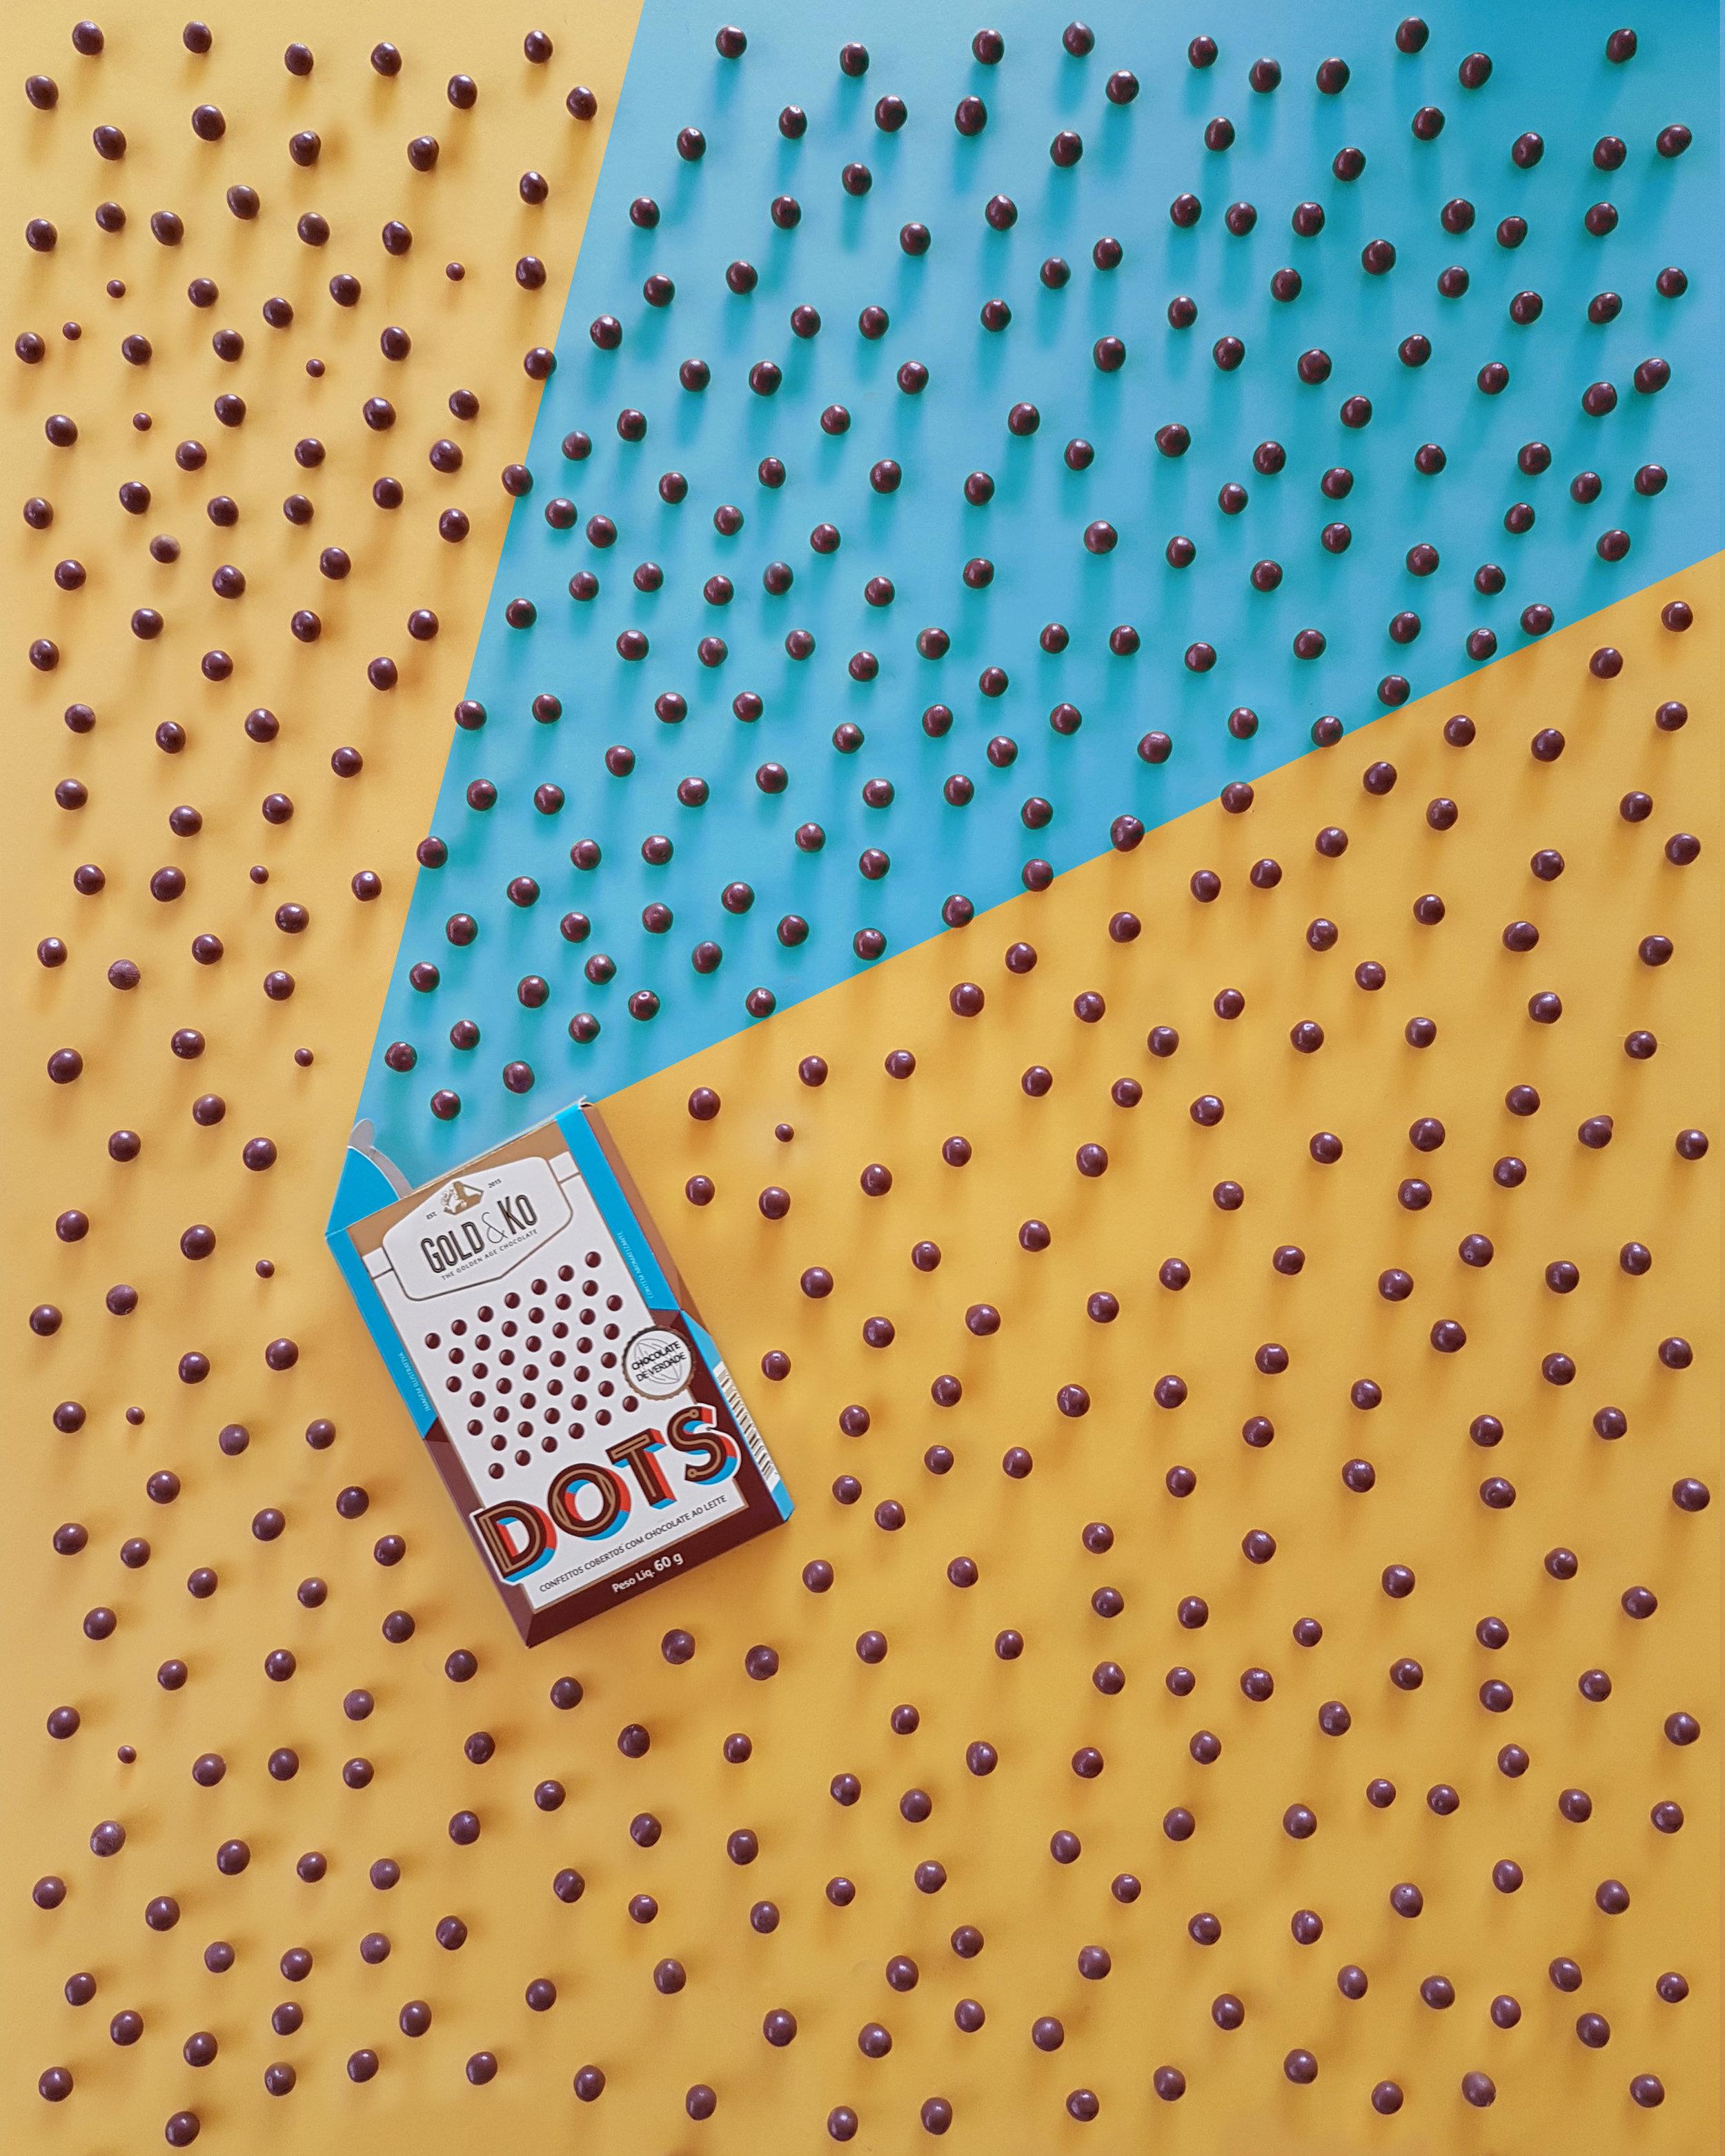 DannyZappa+GoldKo-Dots_AmareloAzul.jpg